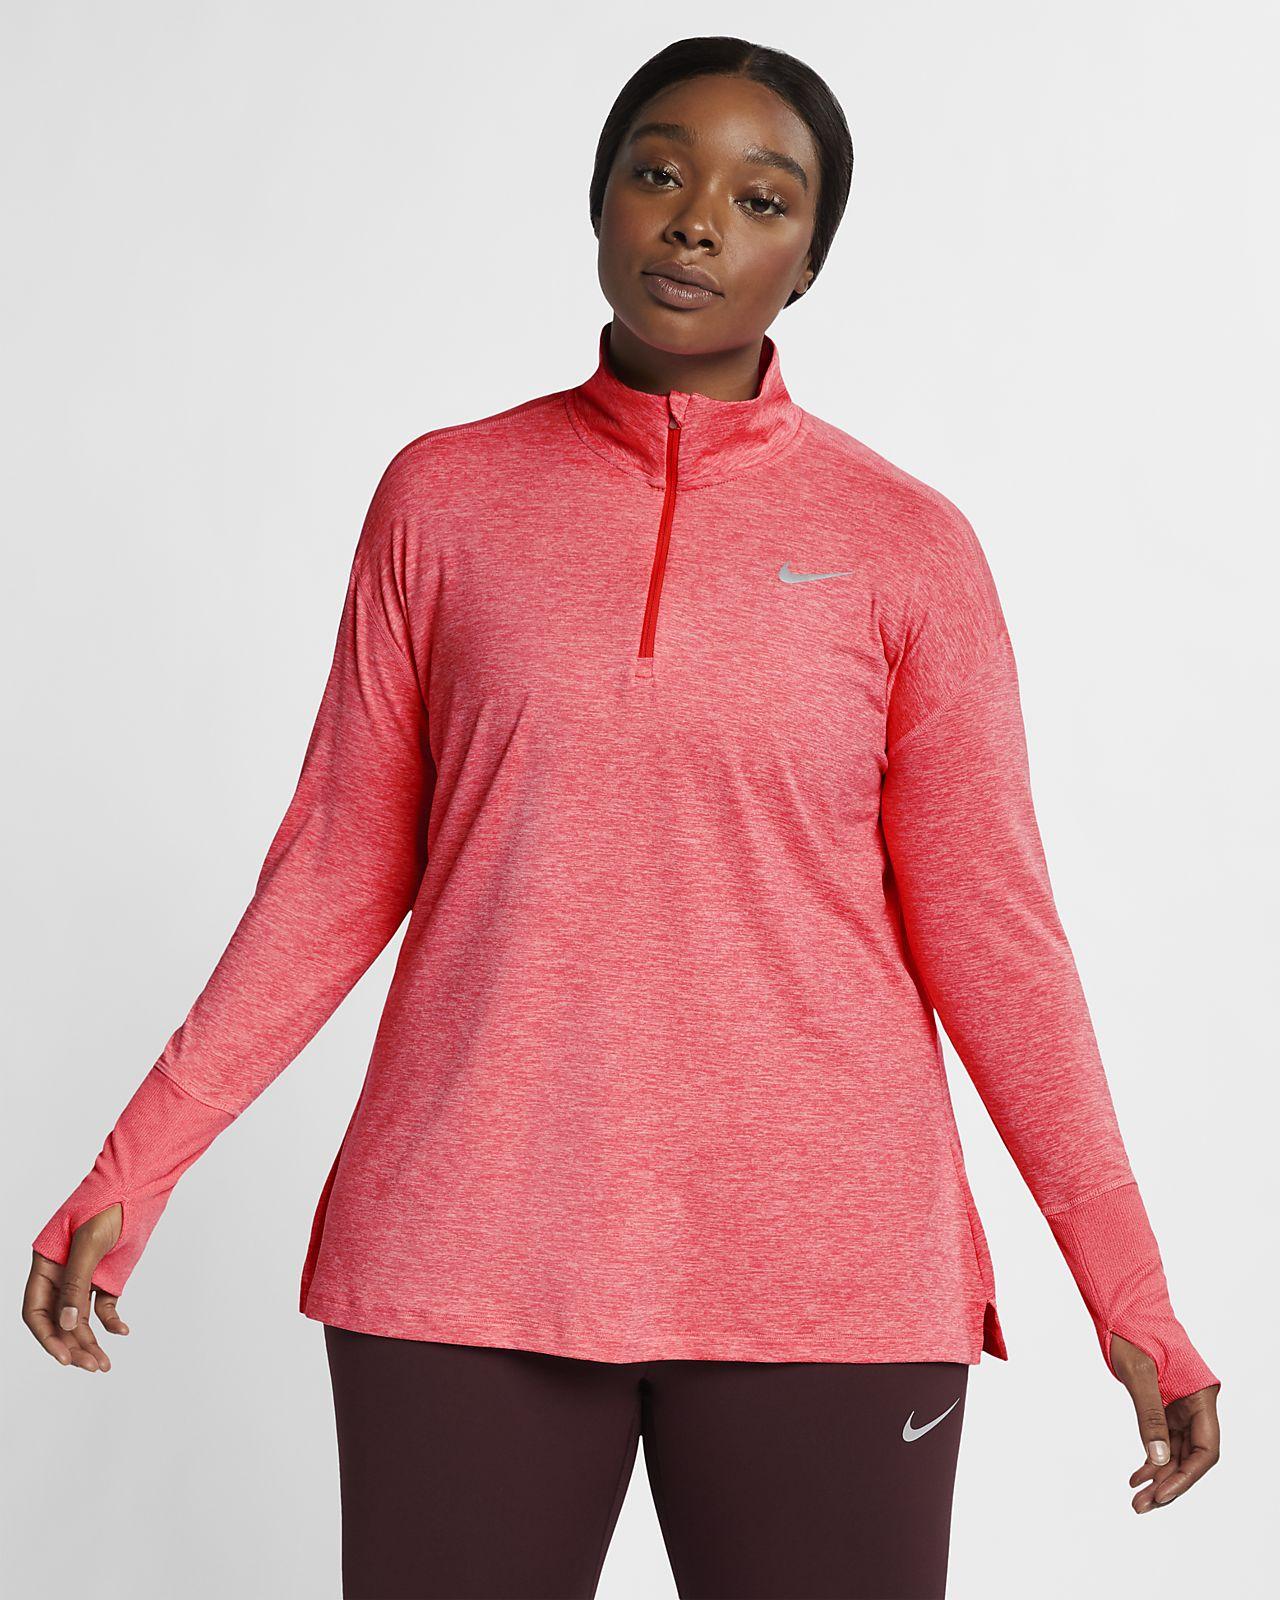 dc55c991d28 Nike Element (Plus Size) Women s Half-Zip Running Top. Nike.com